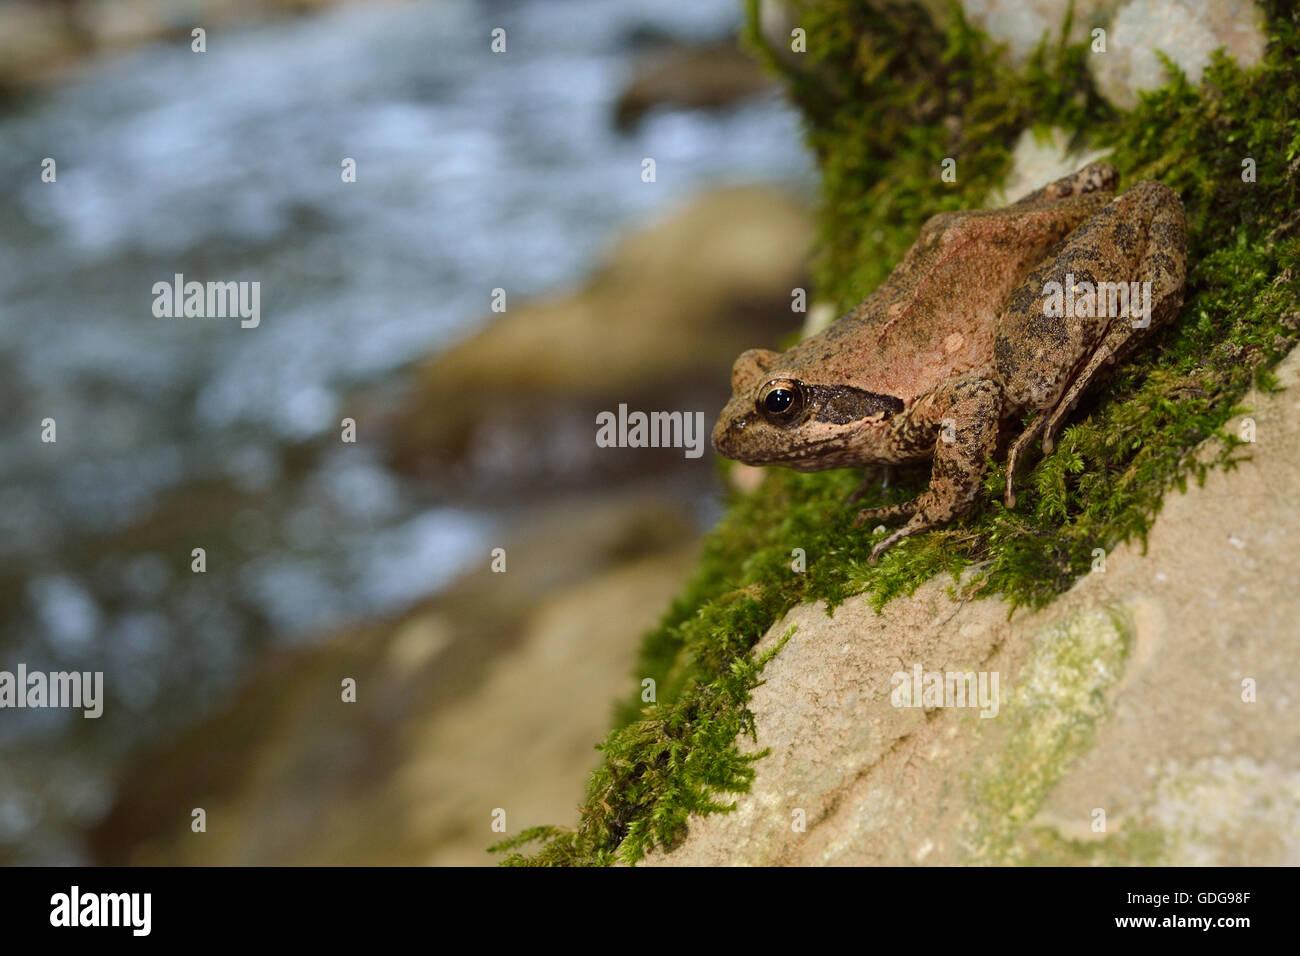 Agile frog, Rana dalmatina, Ranidae, Subiaco, River Aniene Valley, Lazio, Italy - Stock Image